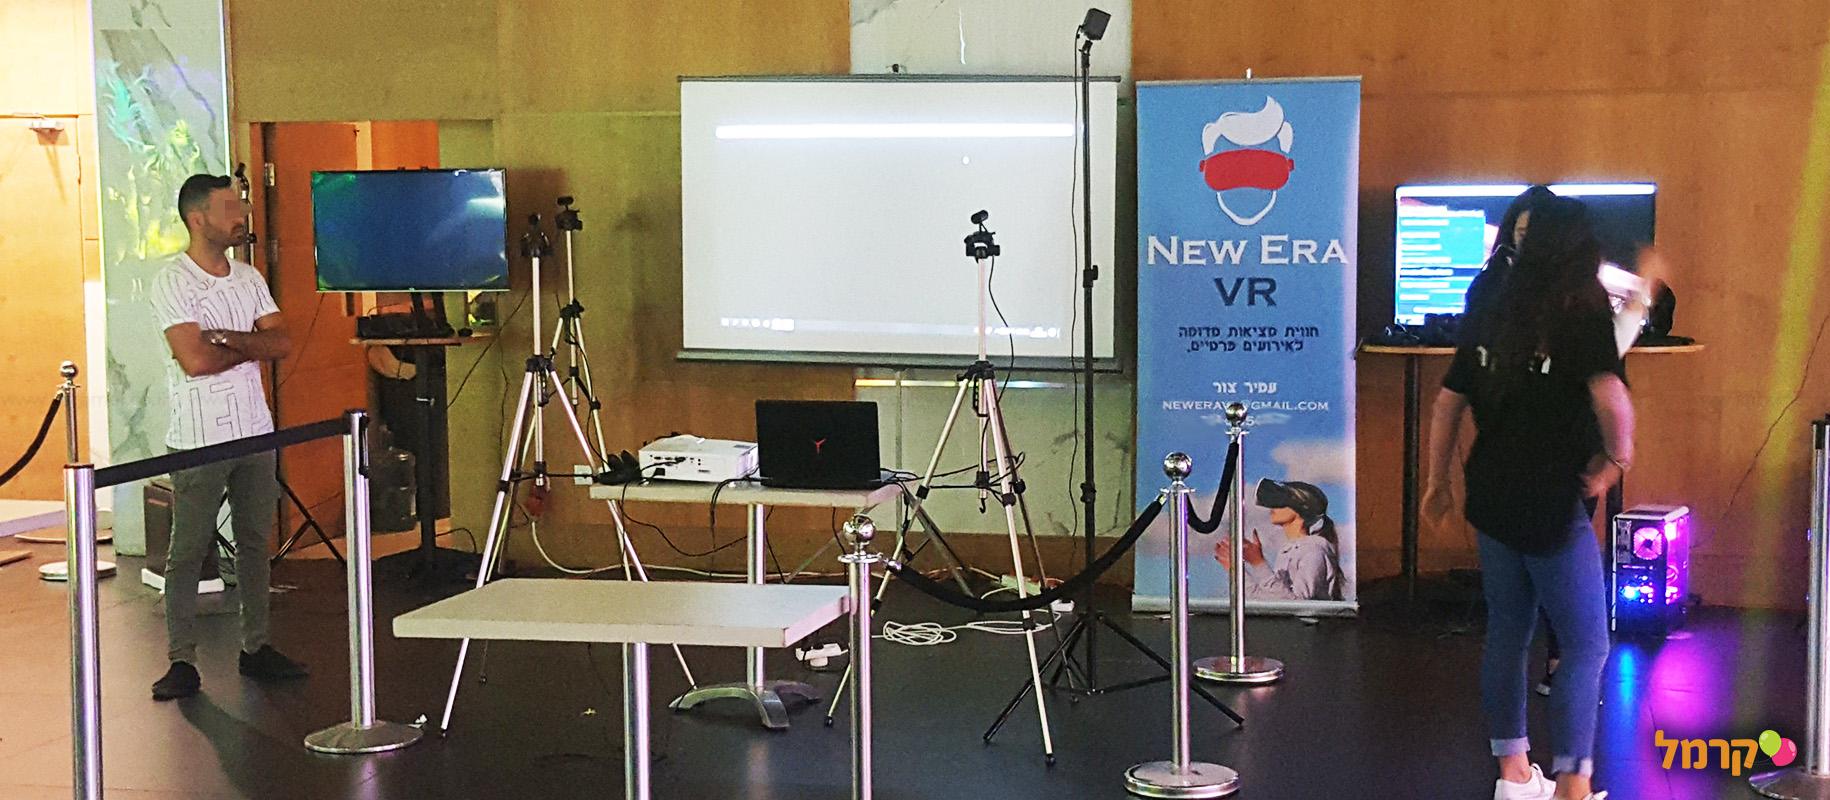 NewEra VR - ניו ארה - 073-7590563